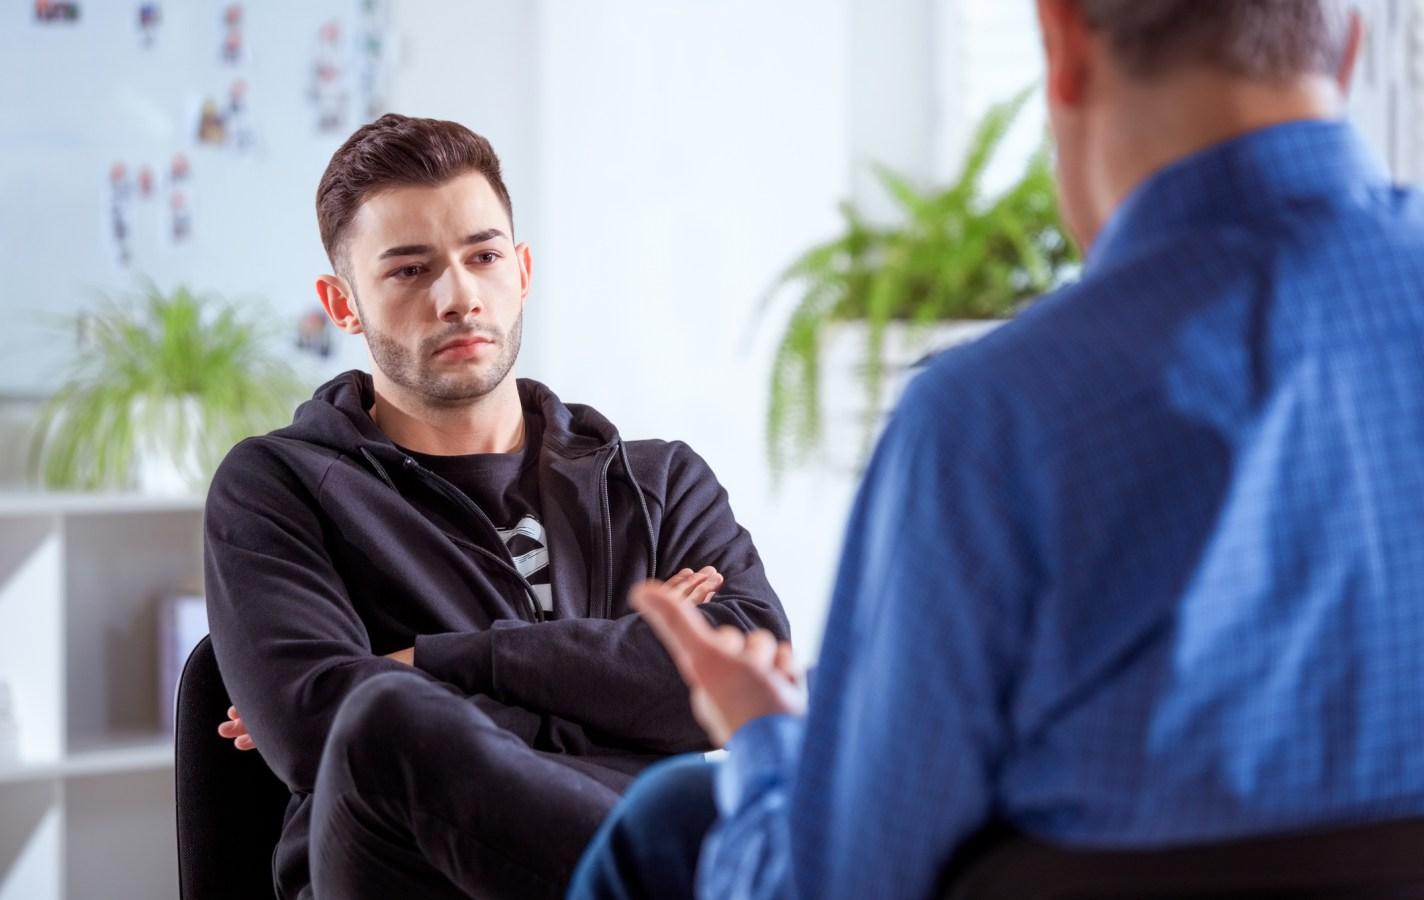 Serious university student listening to therapist